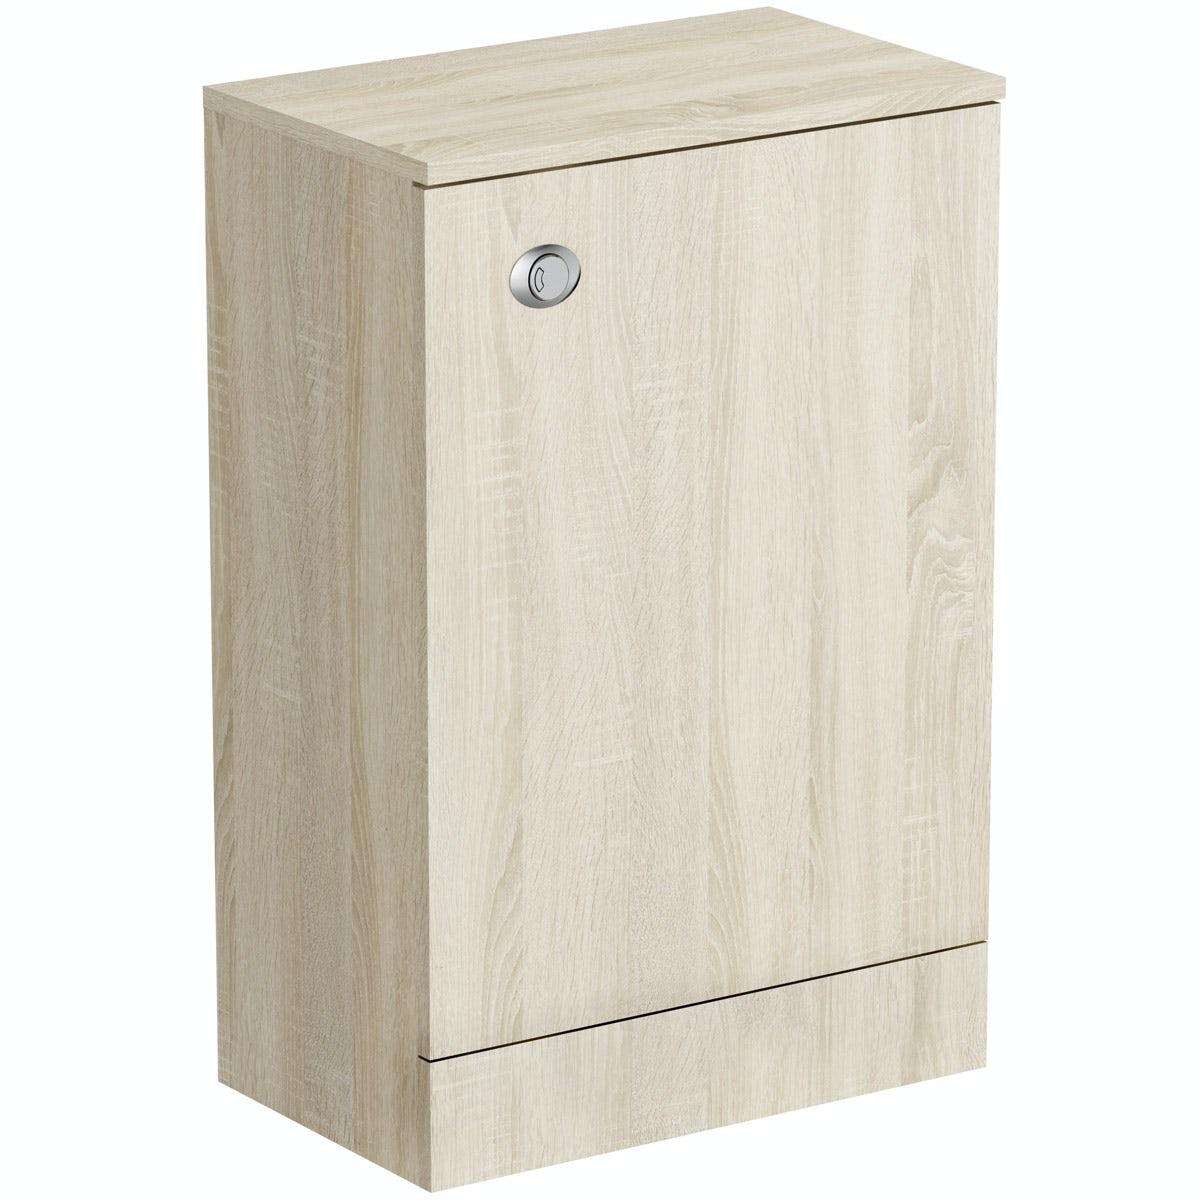 Orchard Wye oak back to wall toilet unit